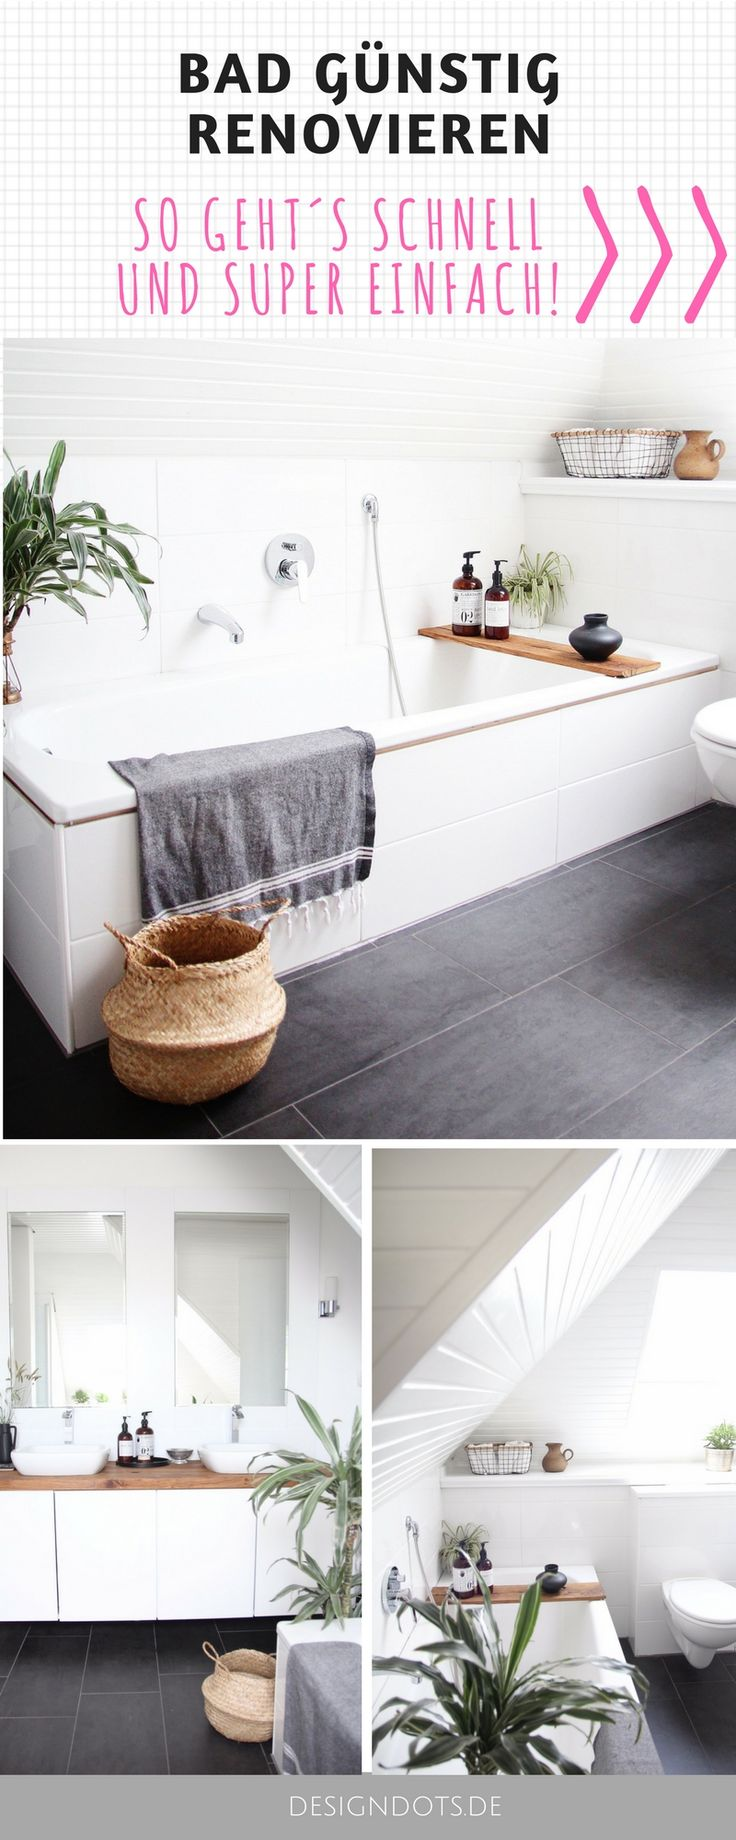 Best 25 Ikea hack bathroom ideas on Pinterest  Ikea hacks Ikea bathroom storage and Ikea bathroom